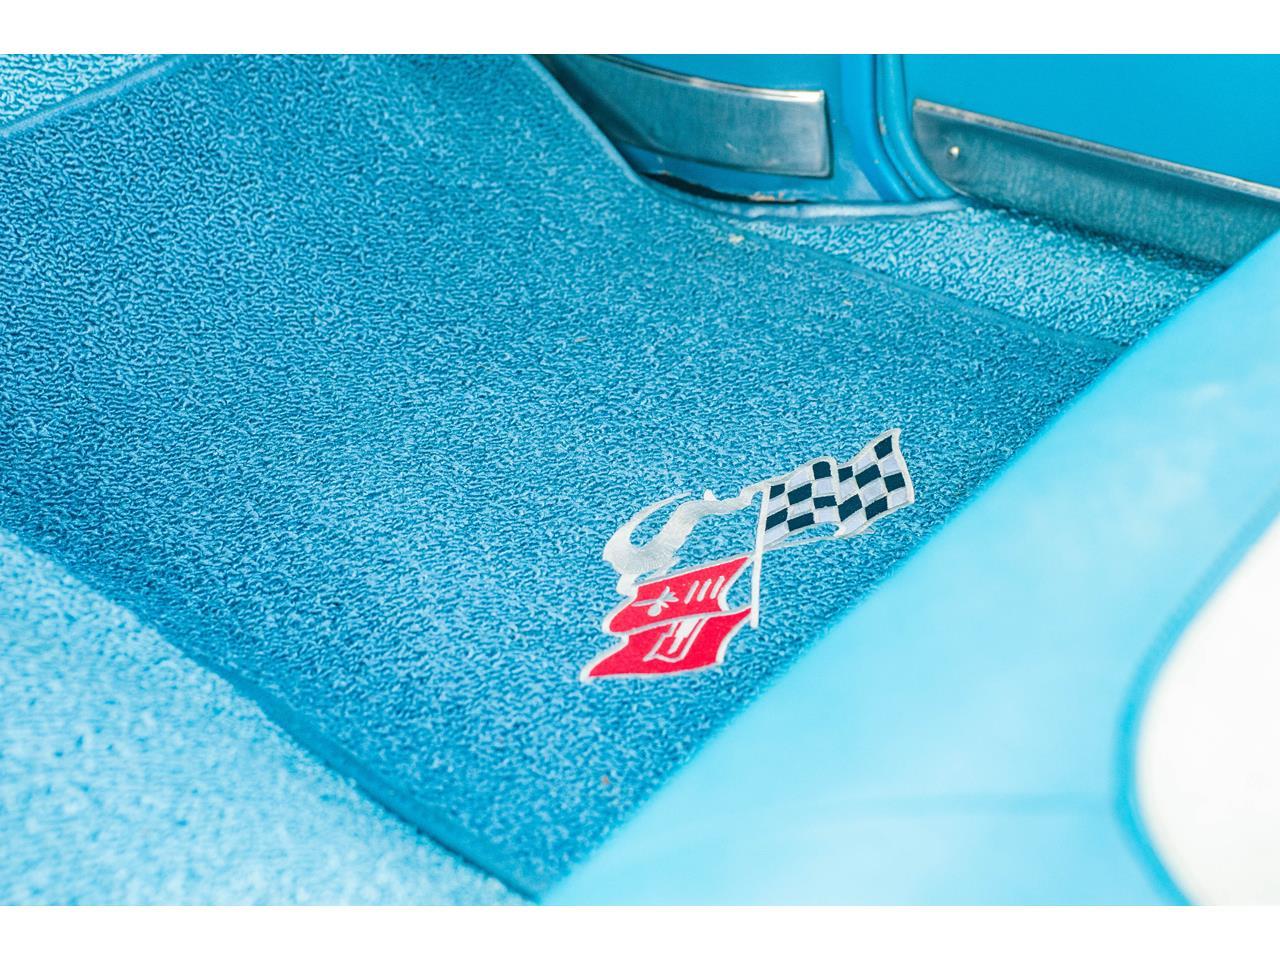 Large Picture of '58 Impala located in Illinois - $62,000.00 - QB9Q